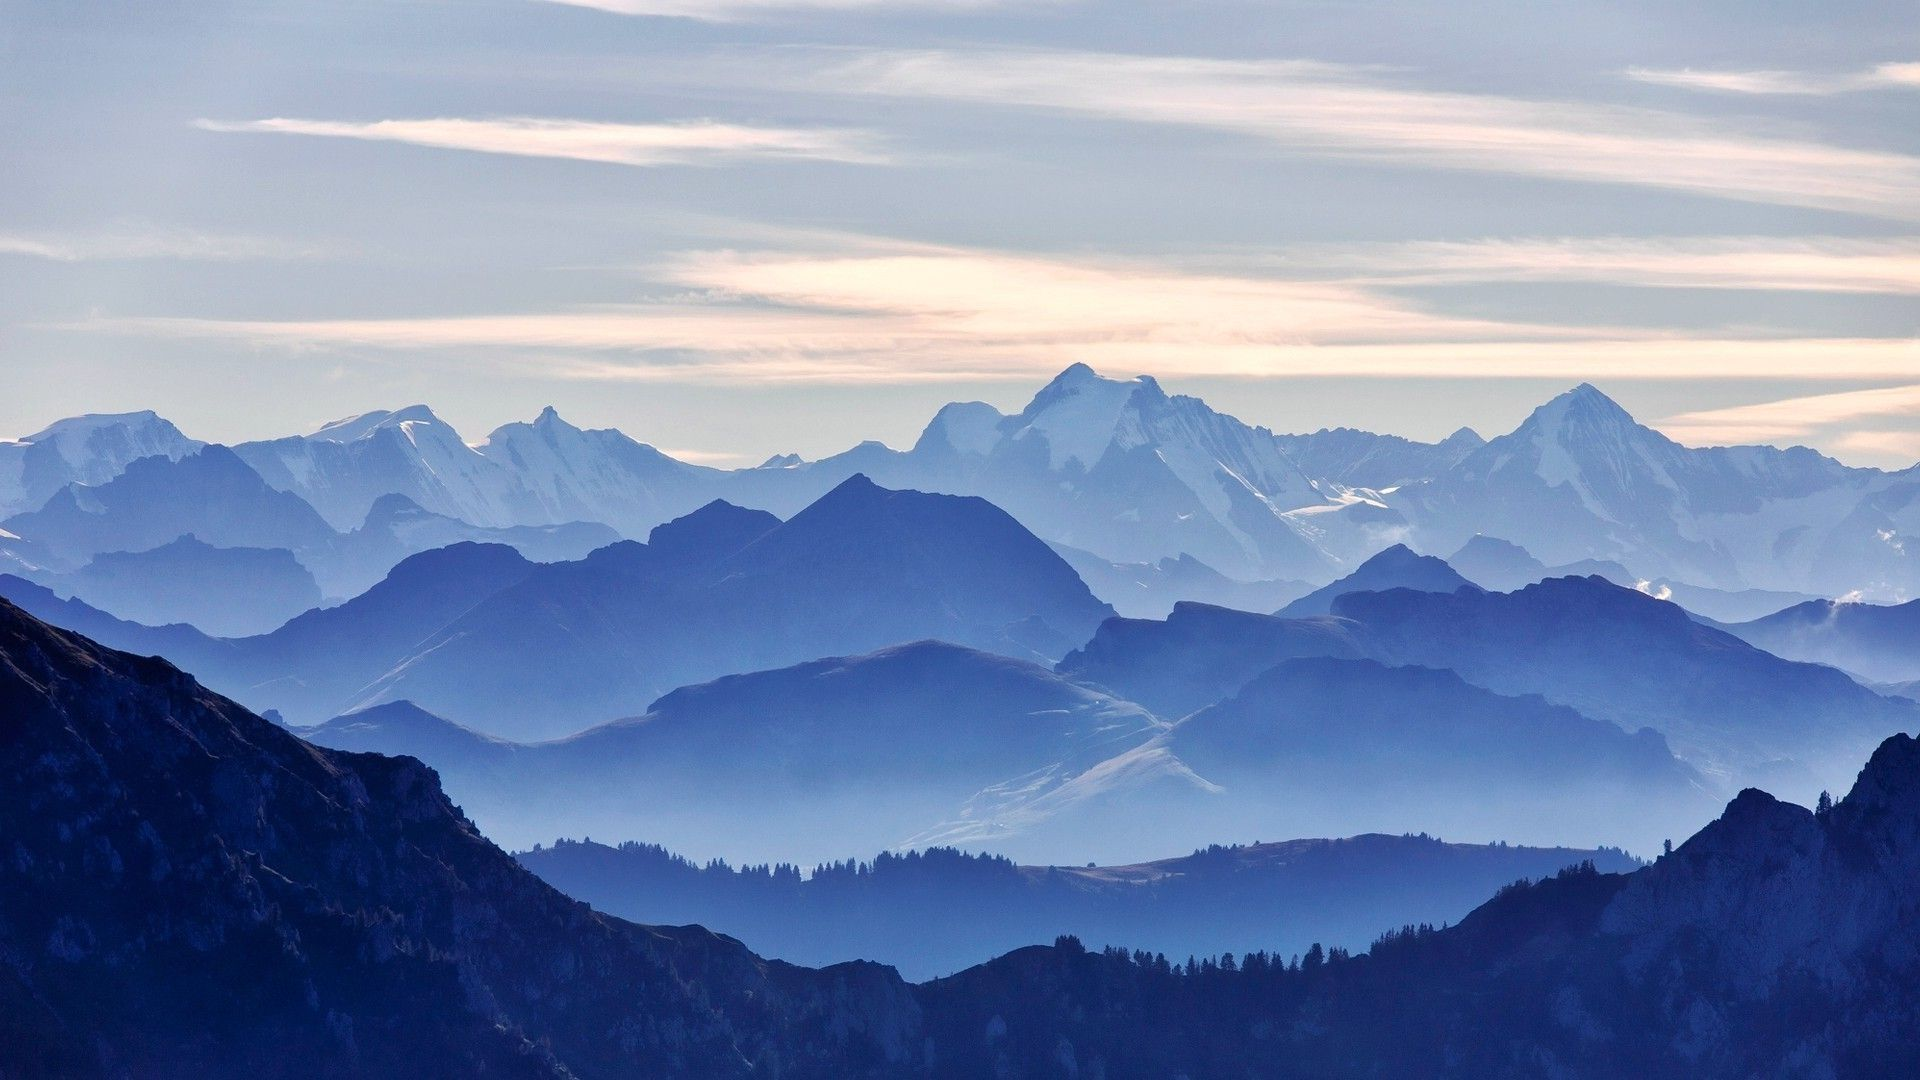 Mountain Background Images 1920x1080 For Windows 10 Landscape Wallpaper Beautiful Landscape Wallpaper Mountain Wallpaper